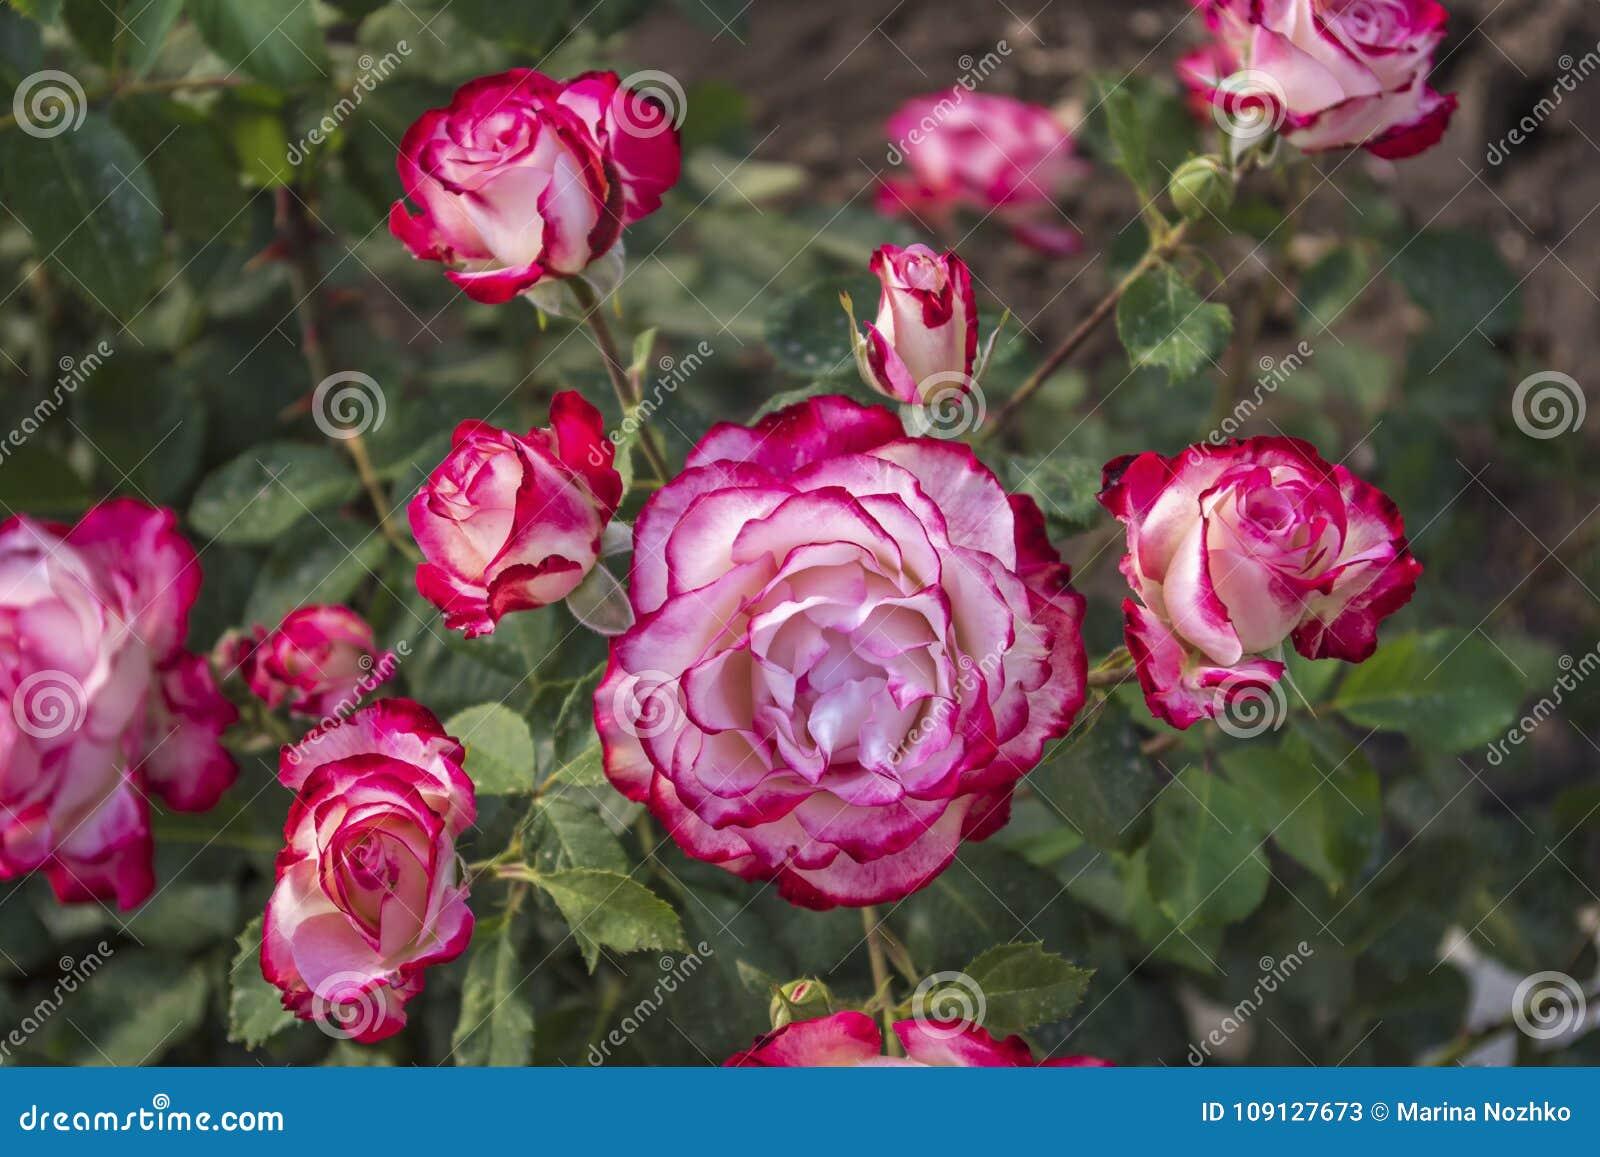 Very beautiful rose flowers bush with unusual colors stock image very beautiful rose flowers bush with unusual colors izmirmasajfo